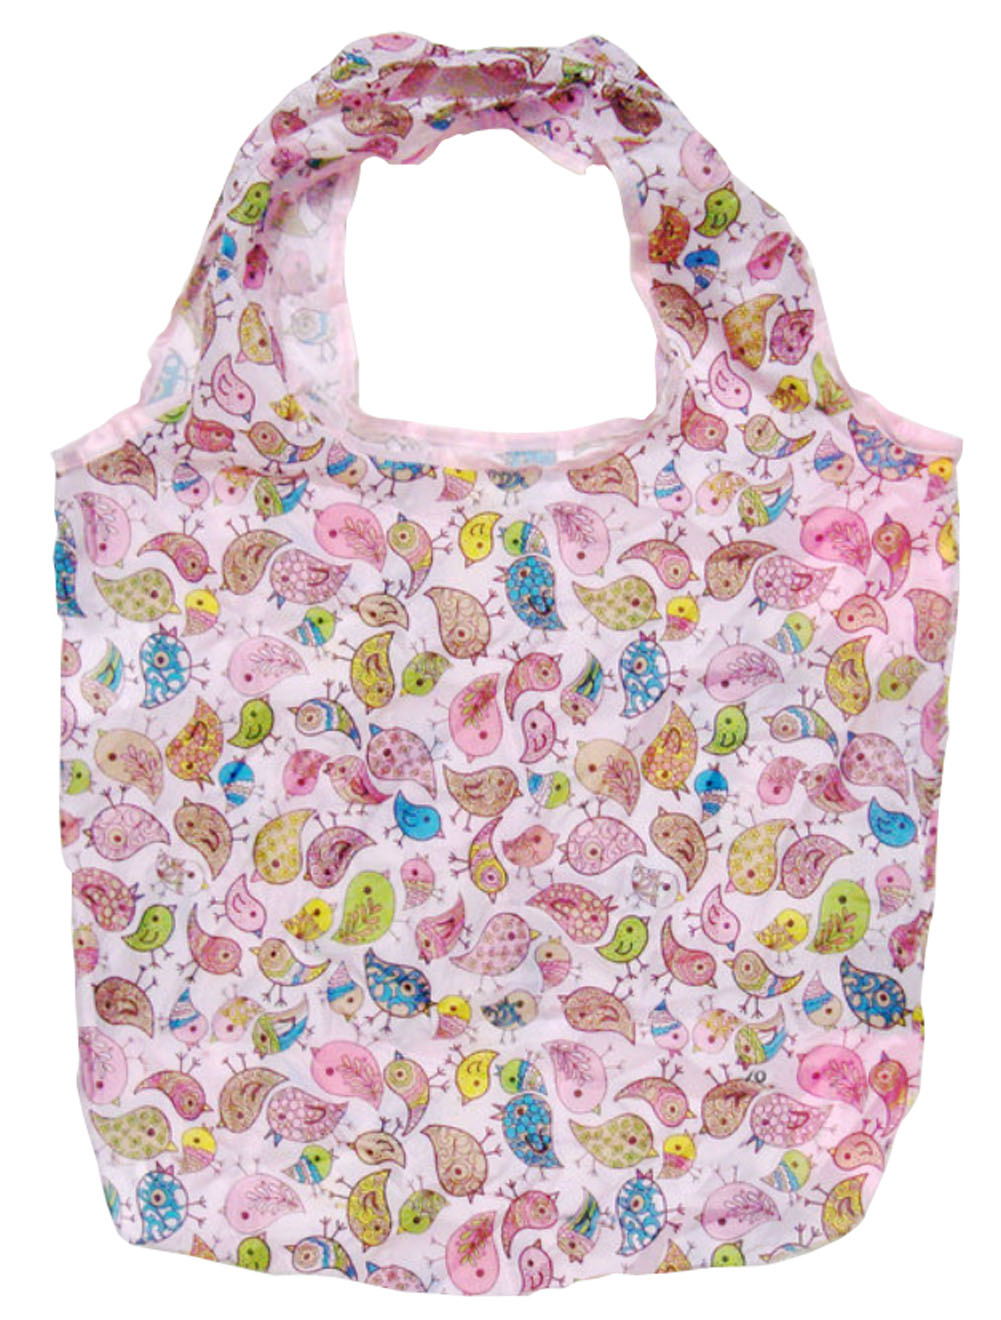 Panda Superstore Creative Bird Folding Compact Eco Reusable/Recycling Shopping Bag PINK